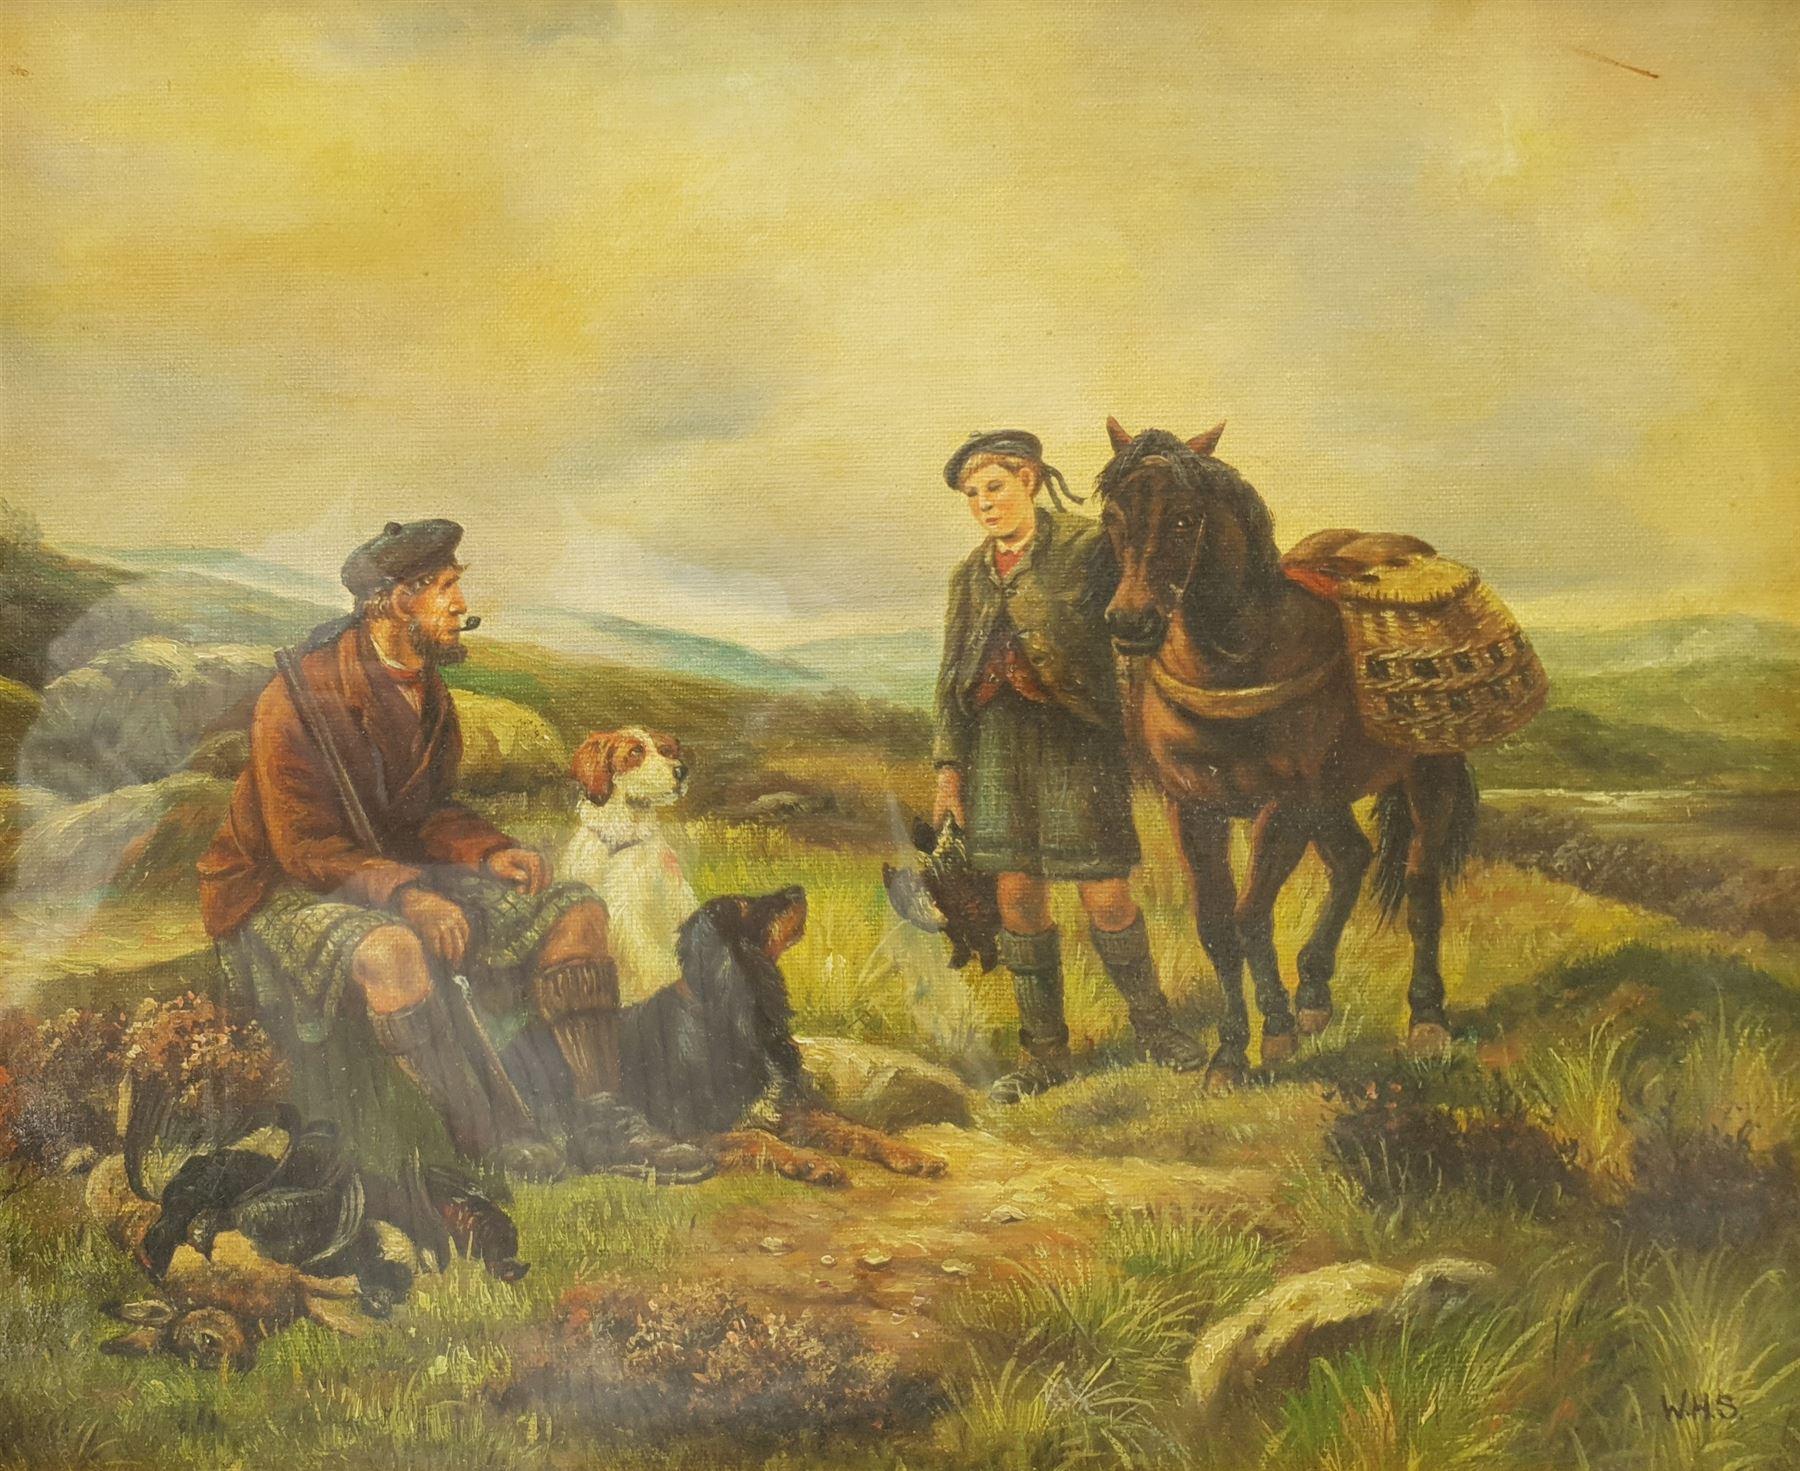 Attrib. William Hamilton Snape (British 1862-1904): Scottish Hunters Taking a Rest